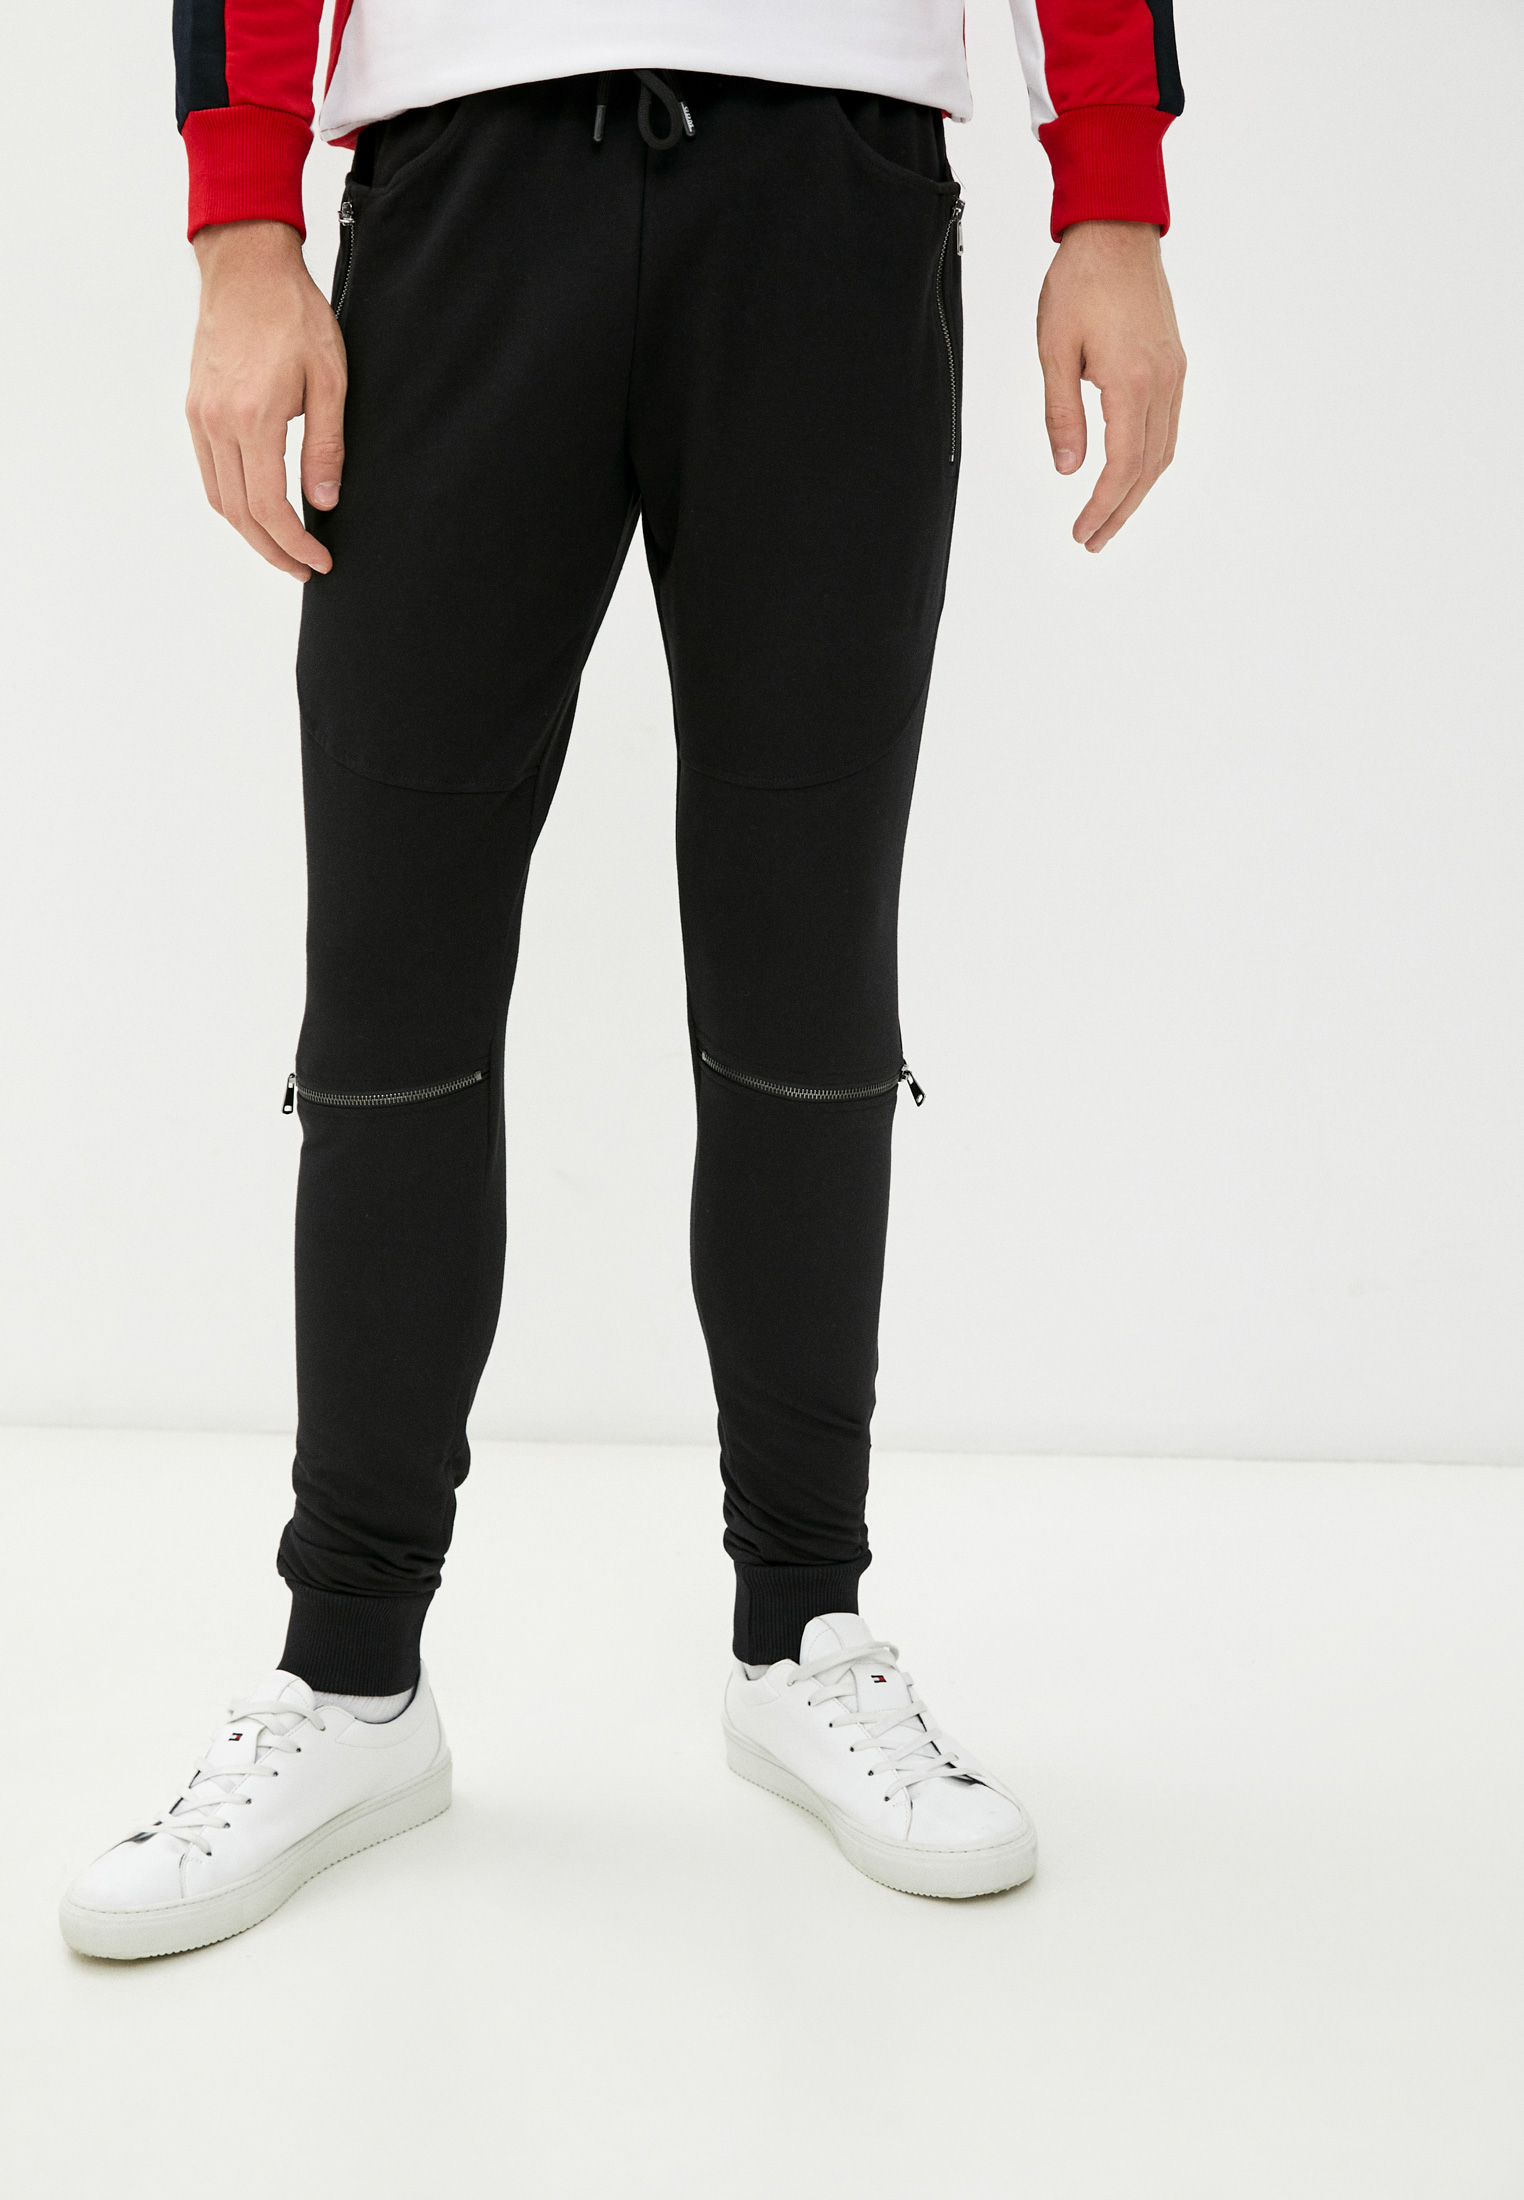 Мужские спортивные брюки GIORGIO DI MARE GI254390